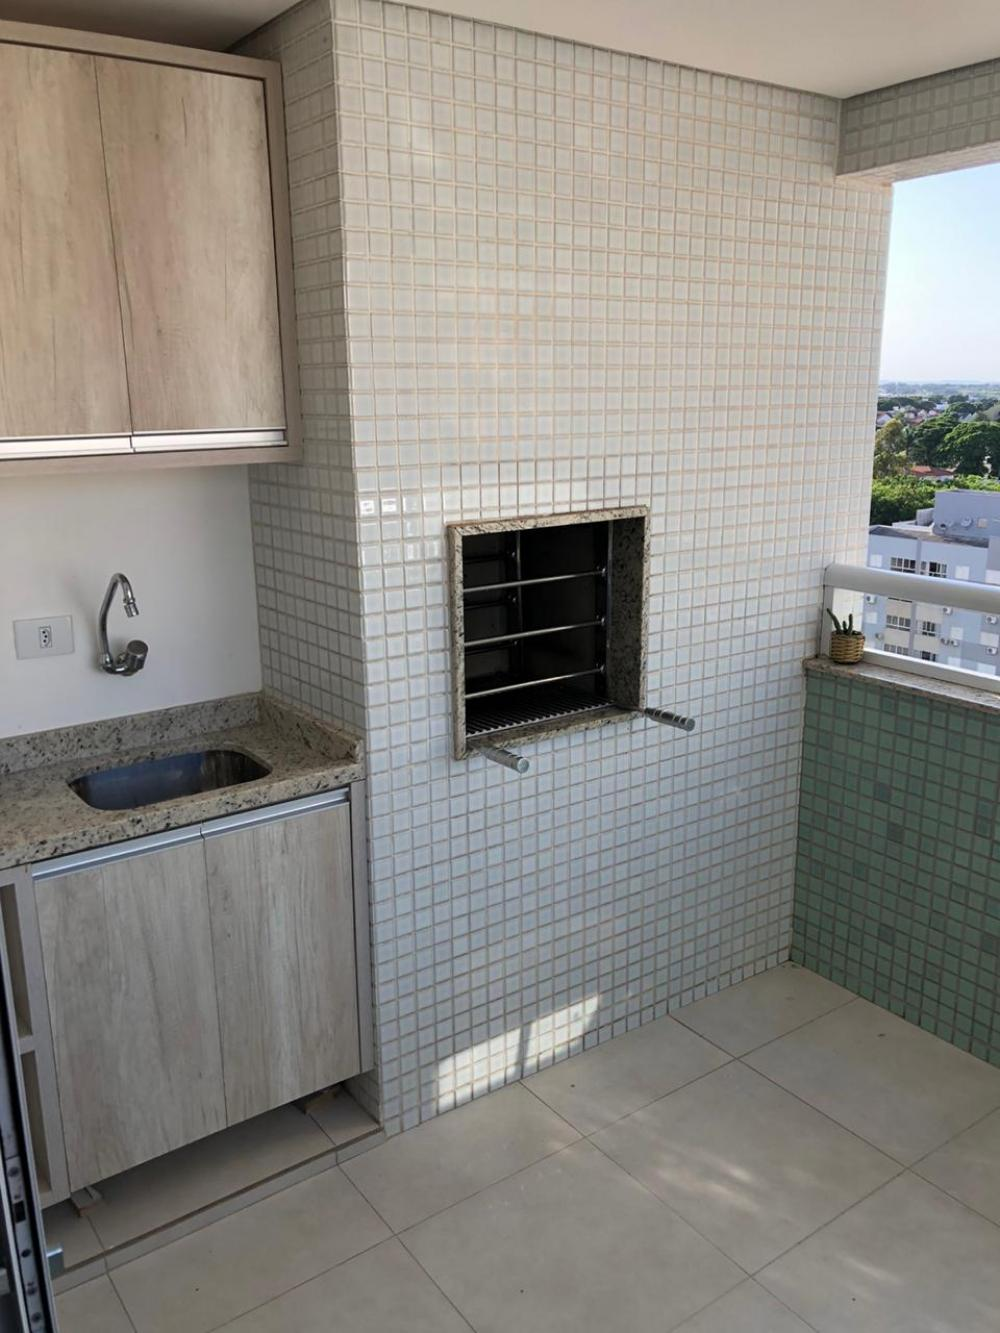 Maringa Apartamento Venda R$465.000,00 3 Dormitorios 1 Suite Area construida 86.87m2